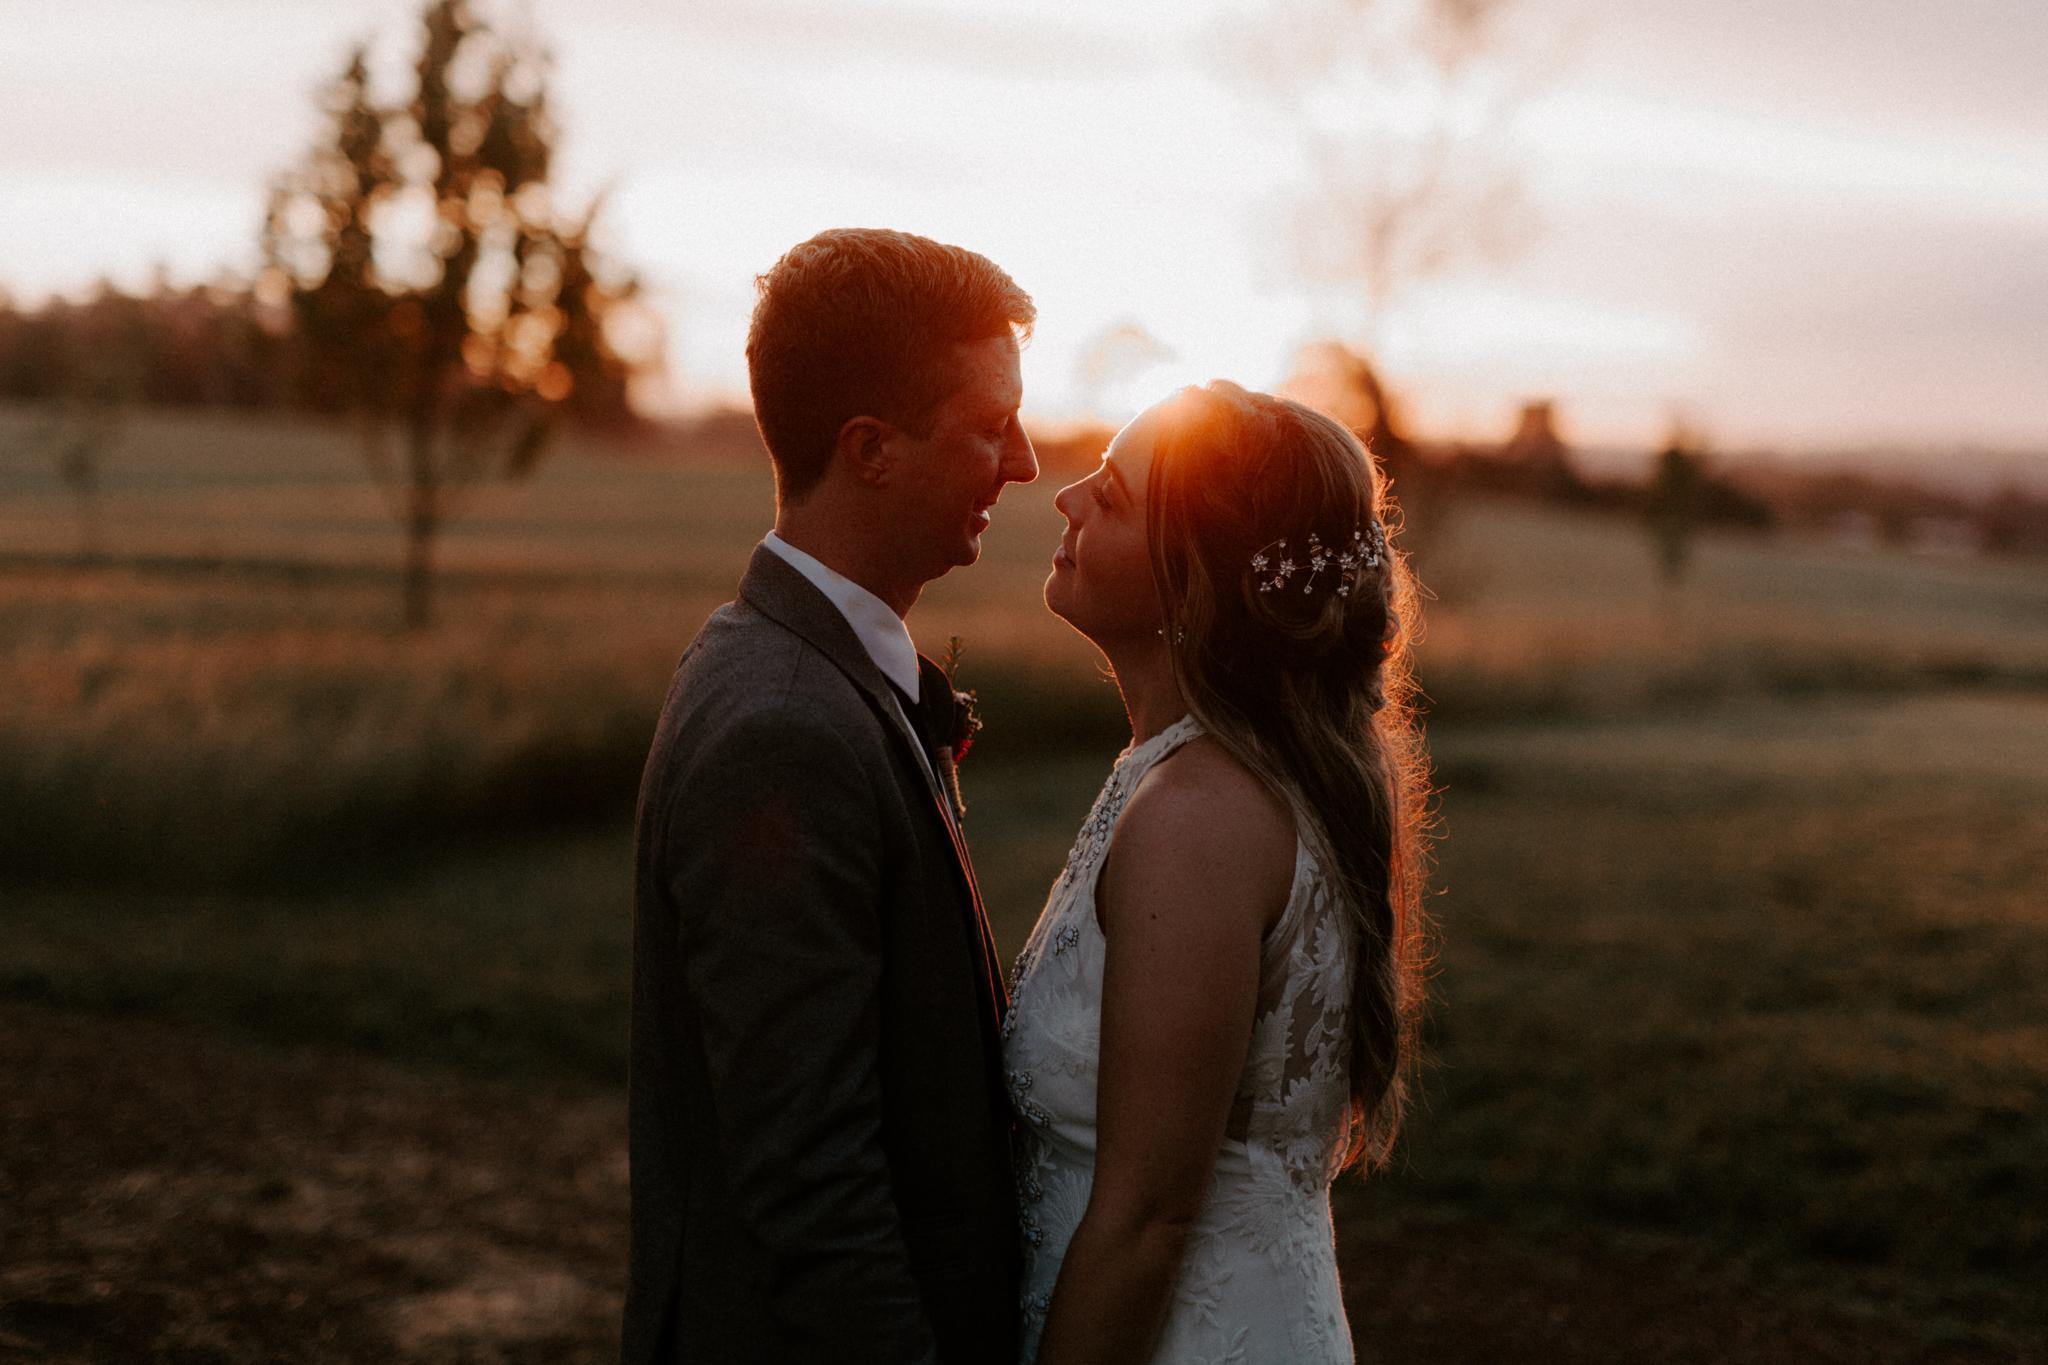 Wandin-Park-Estate-Wedding-Emotions-and-Math-Photography-210.jpg